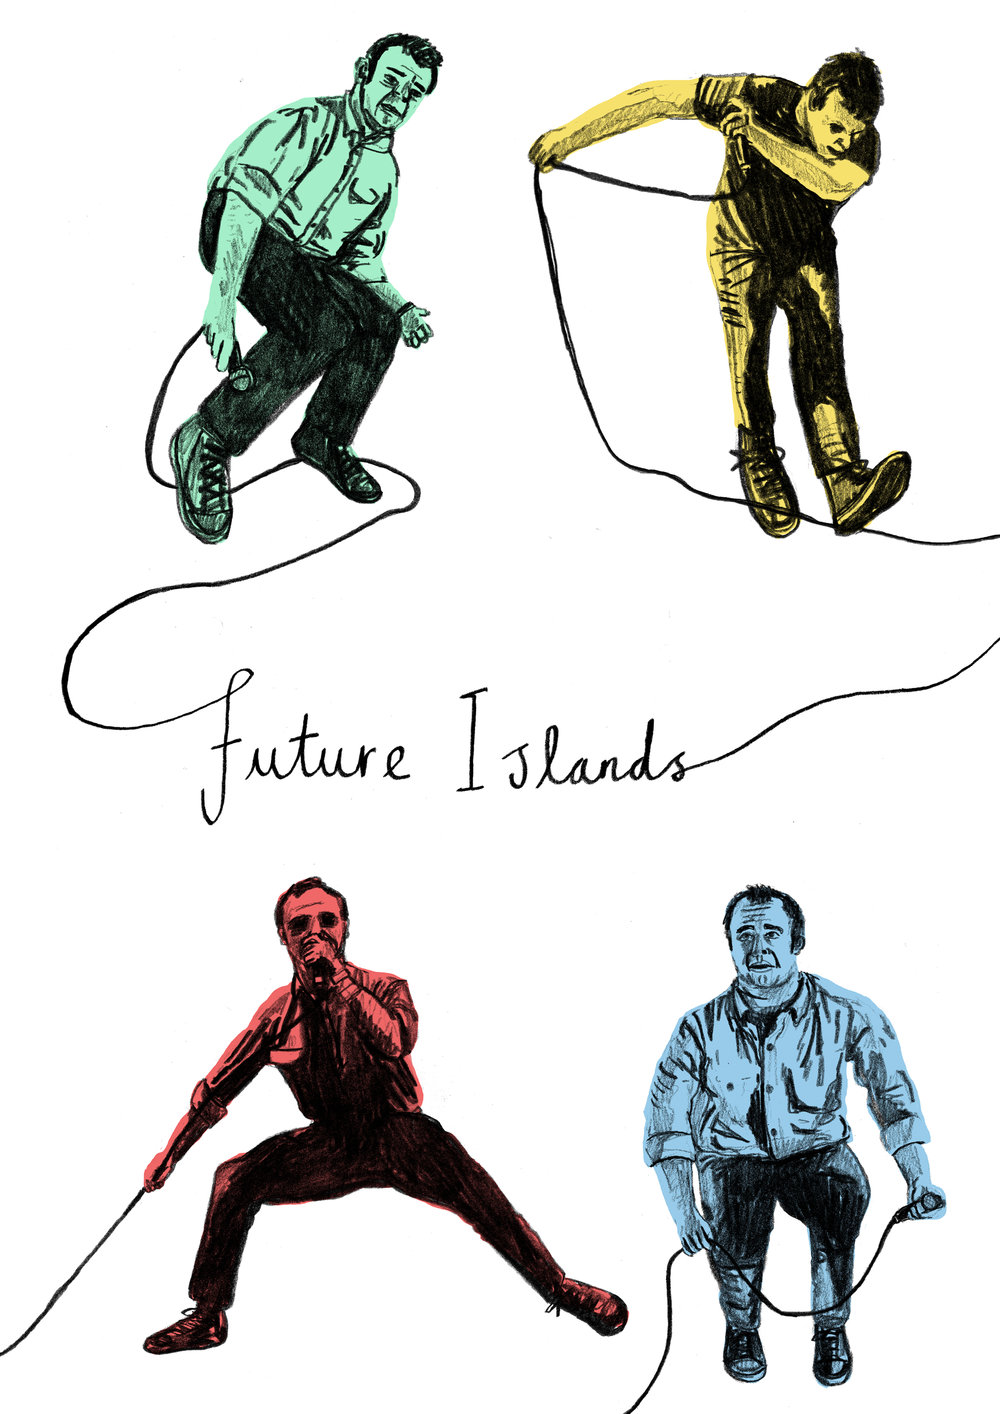 future+islands+poser+1+copy.jpg